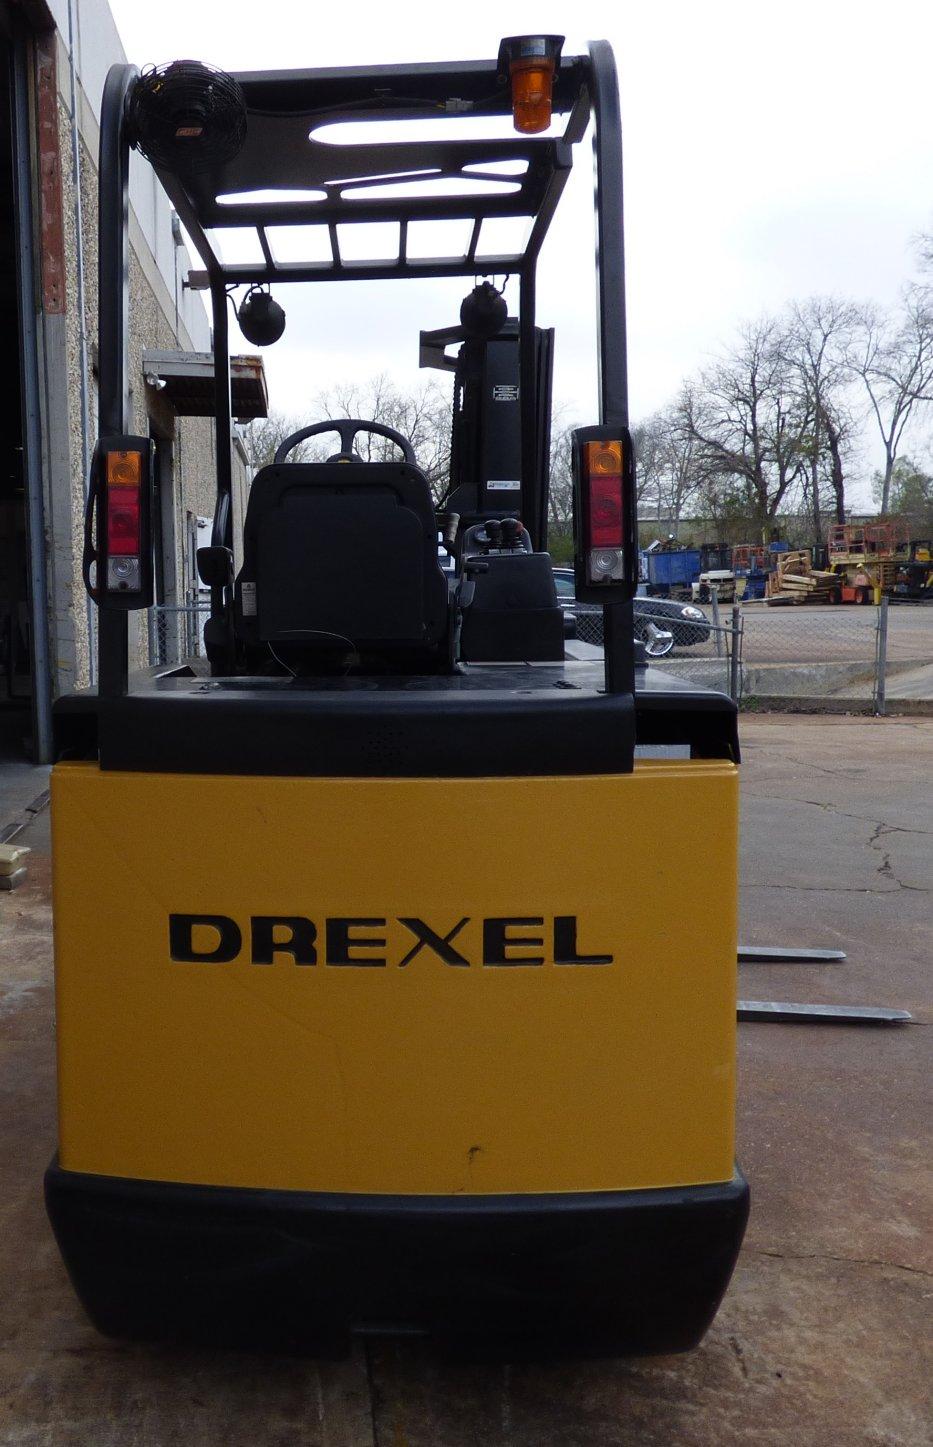 FL694 - Drexel DX SLF40 Turret Truck